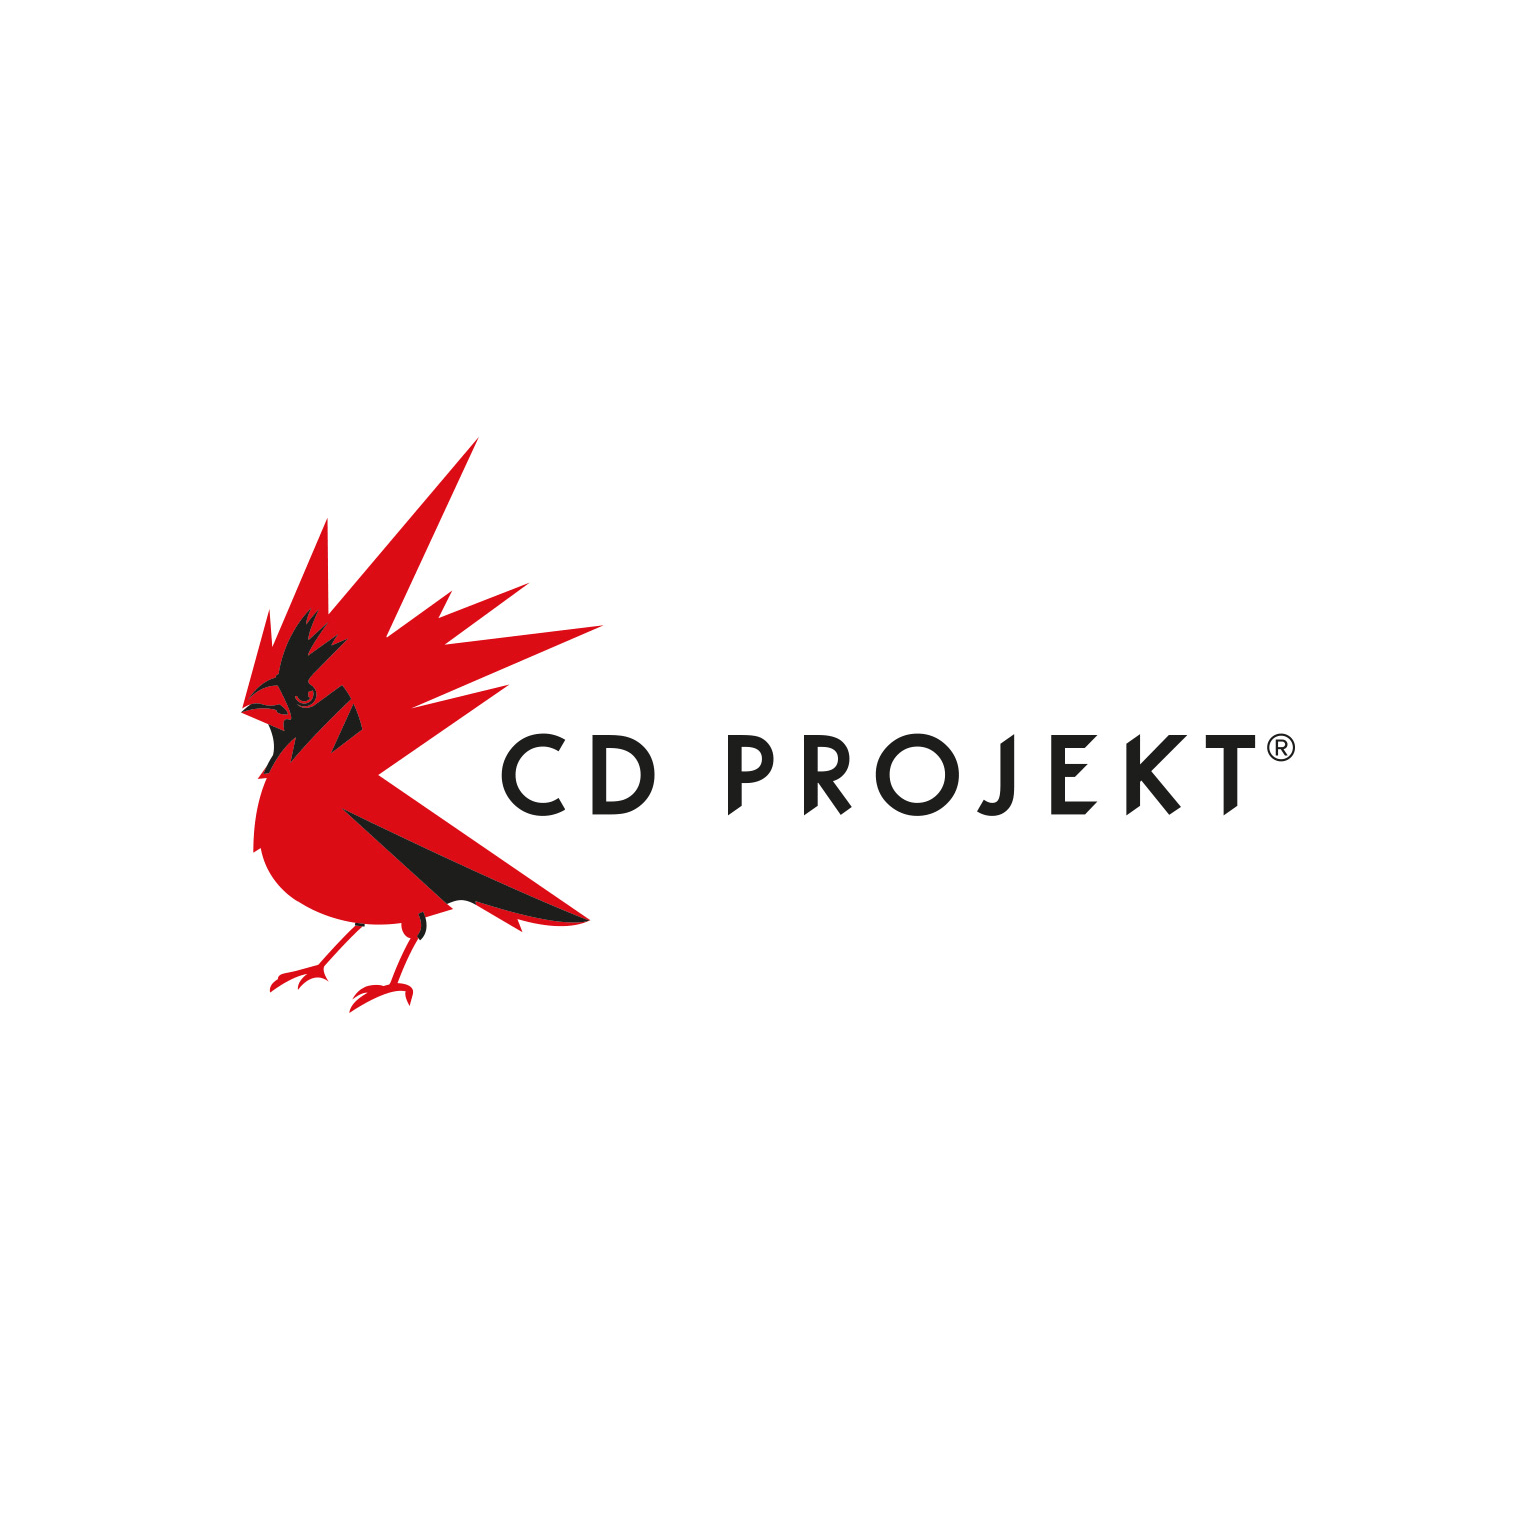 CD PROJECT | Fundamentale Aktienanalyse